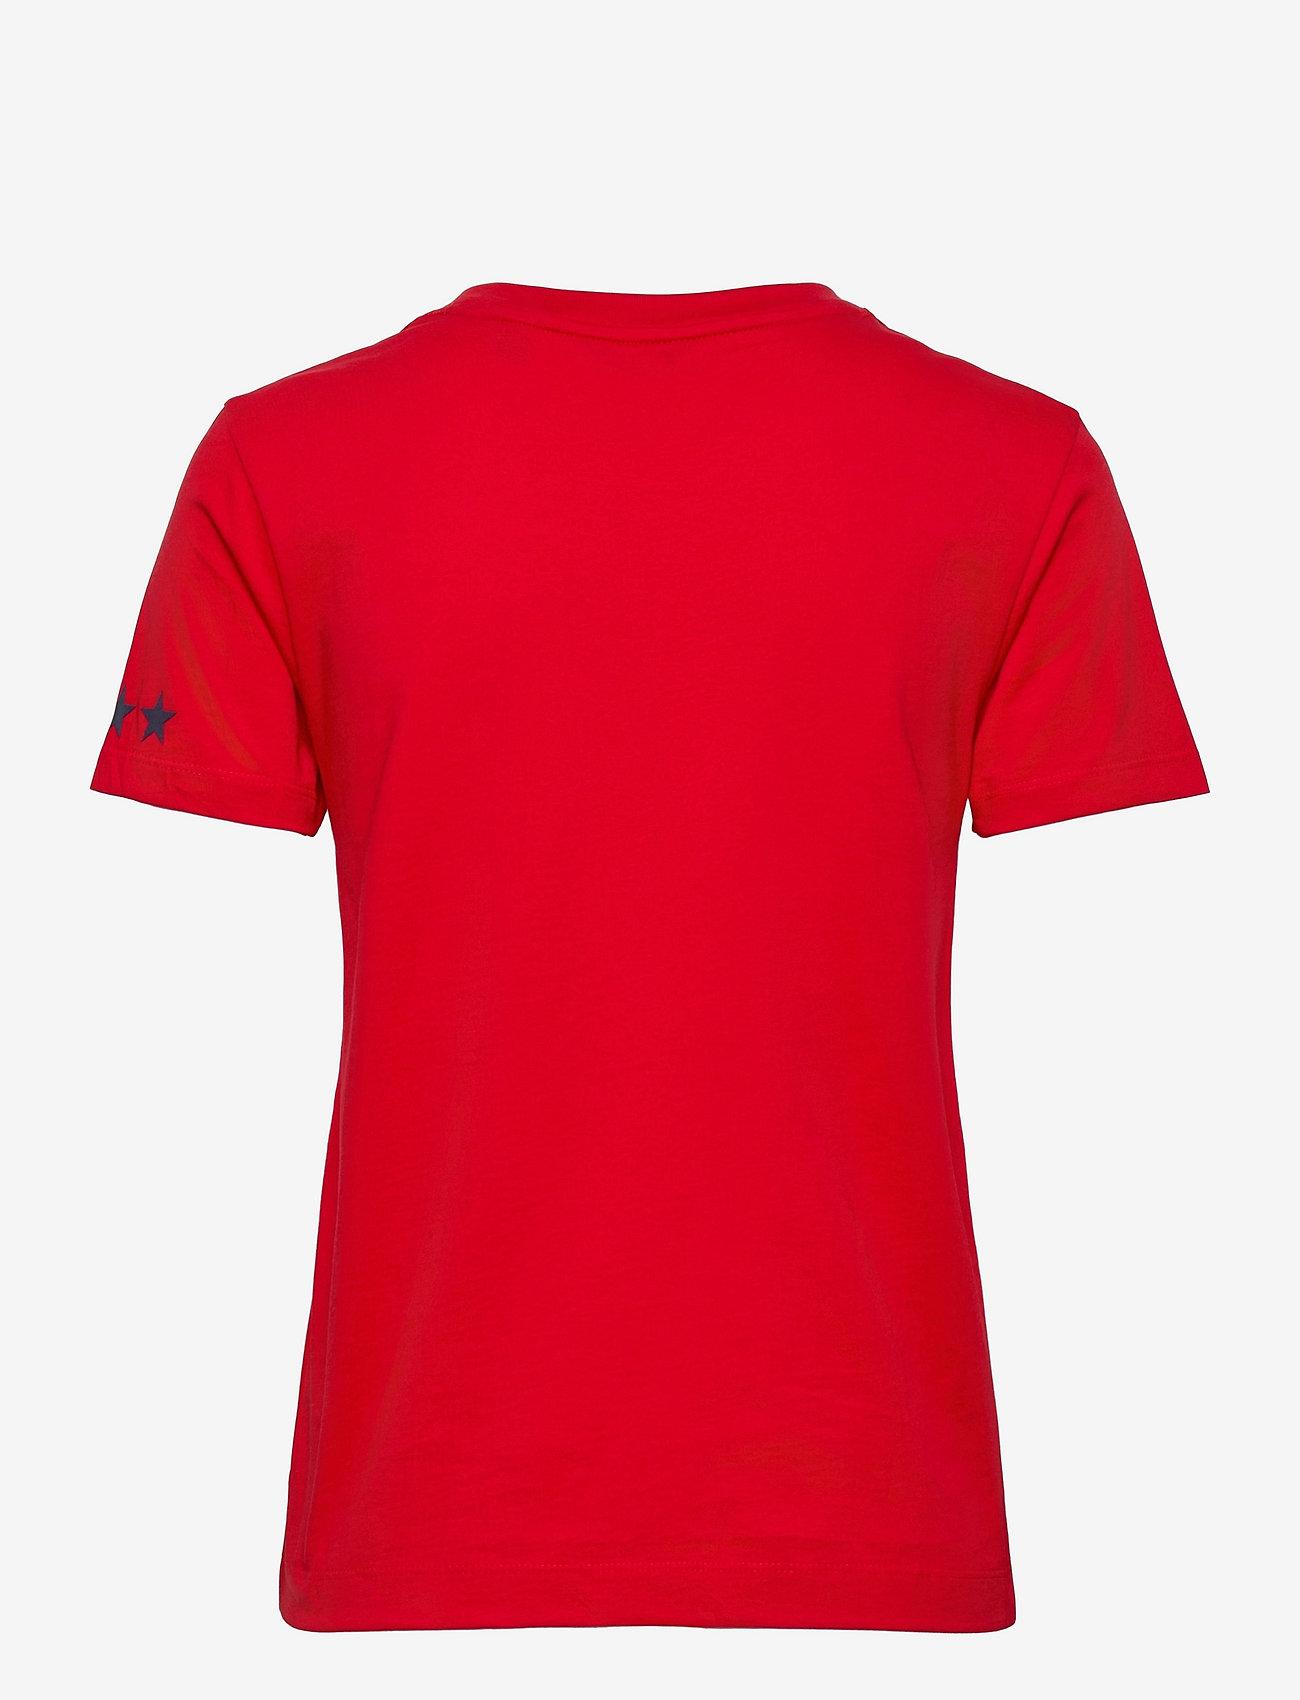 GANT - D2.GANT RETRO SHIELD SS T-SHIRT - t-shirts - bright red - 1